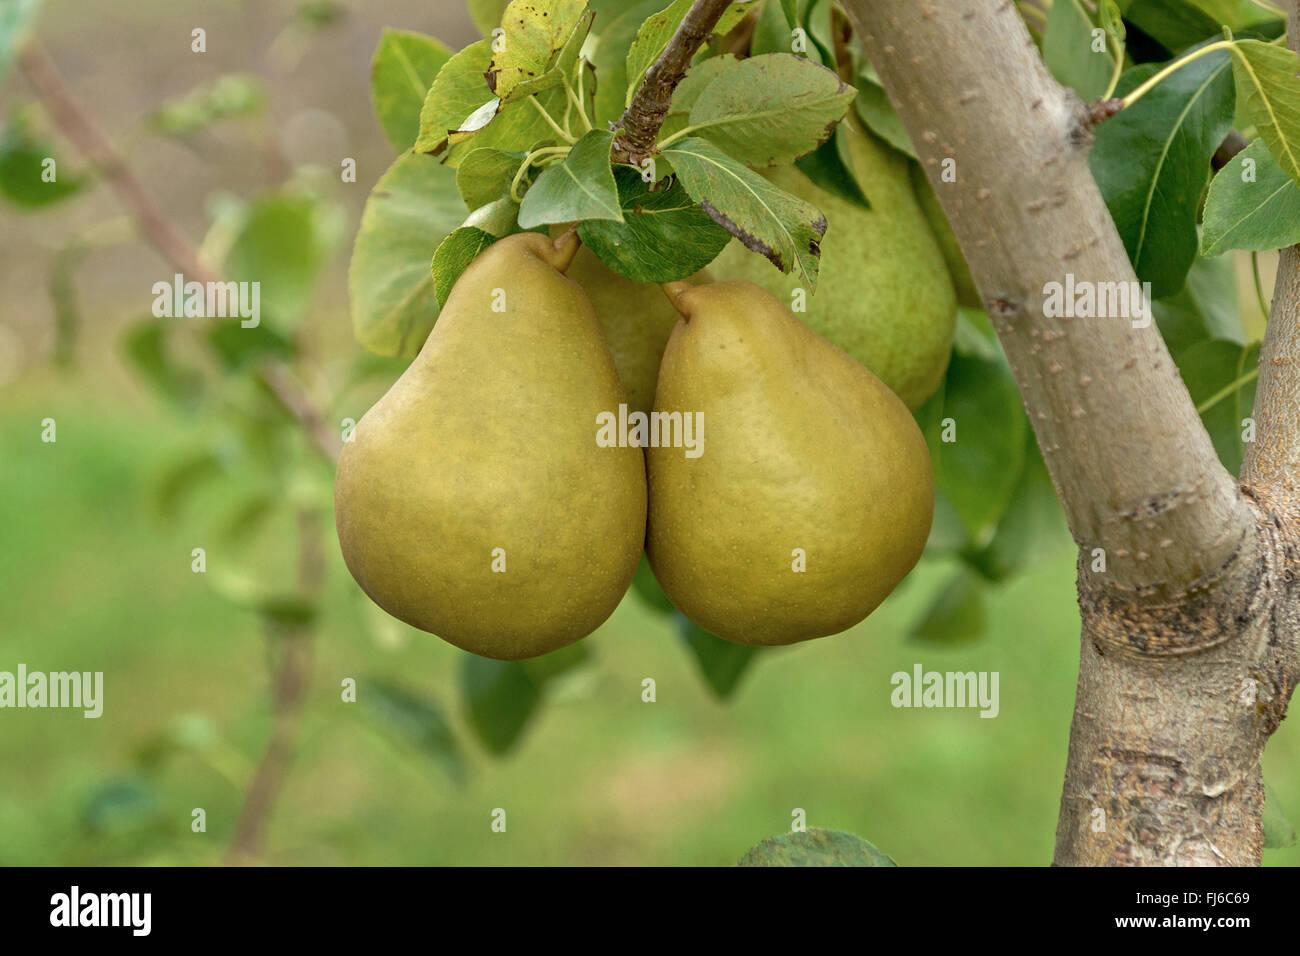 Common pear (Pyrus communis 'Grand Champion', Pyrus communis Grand Champion), pears on a tree, cultivar - Stock Image